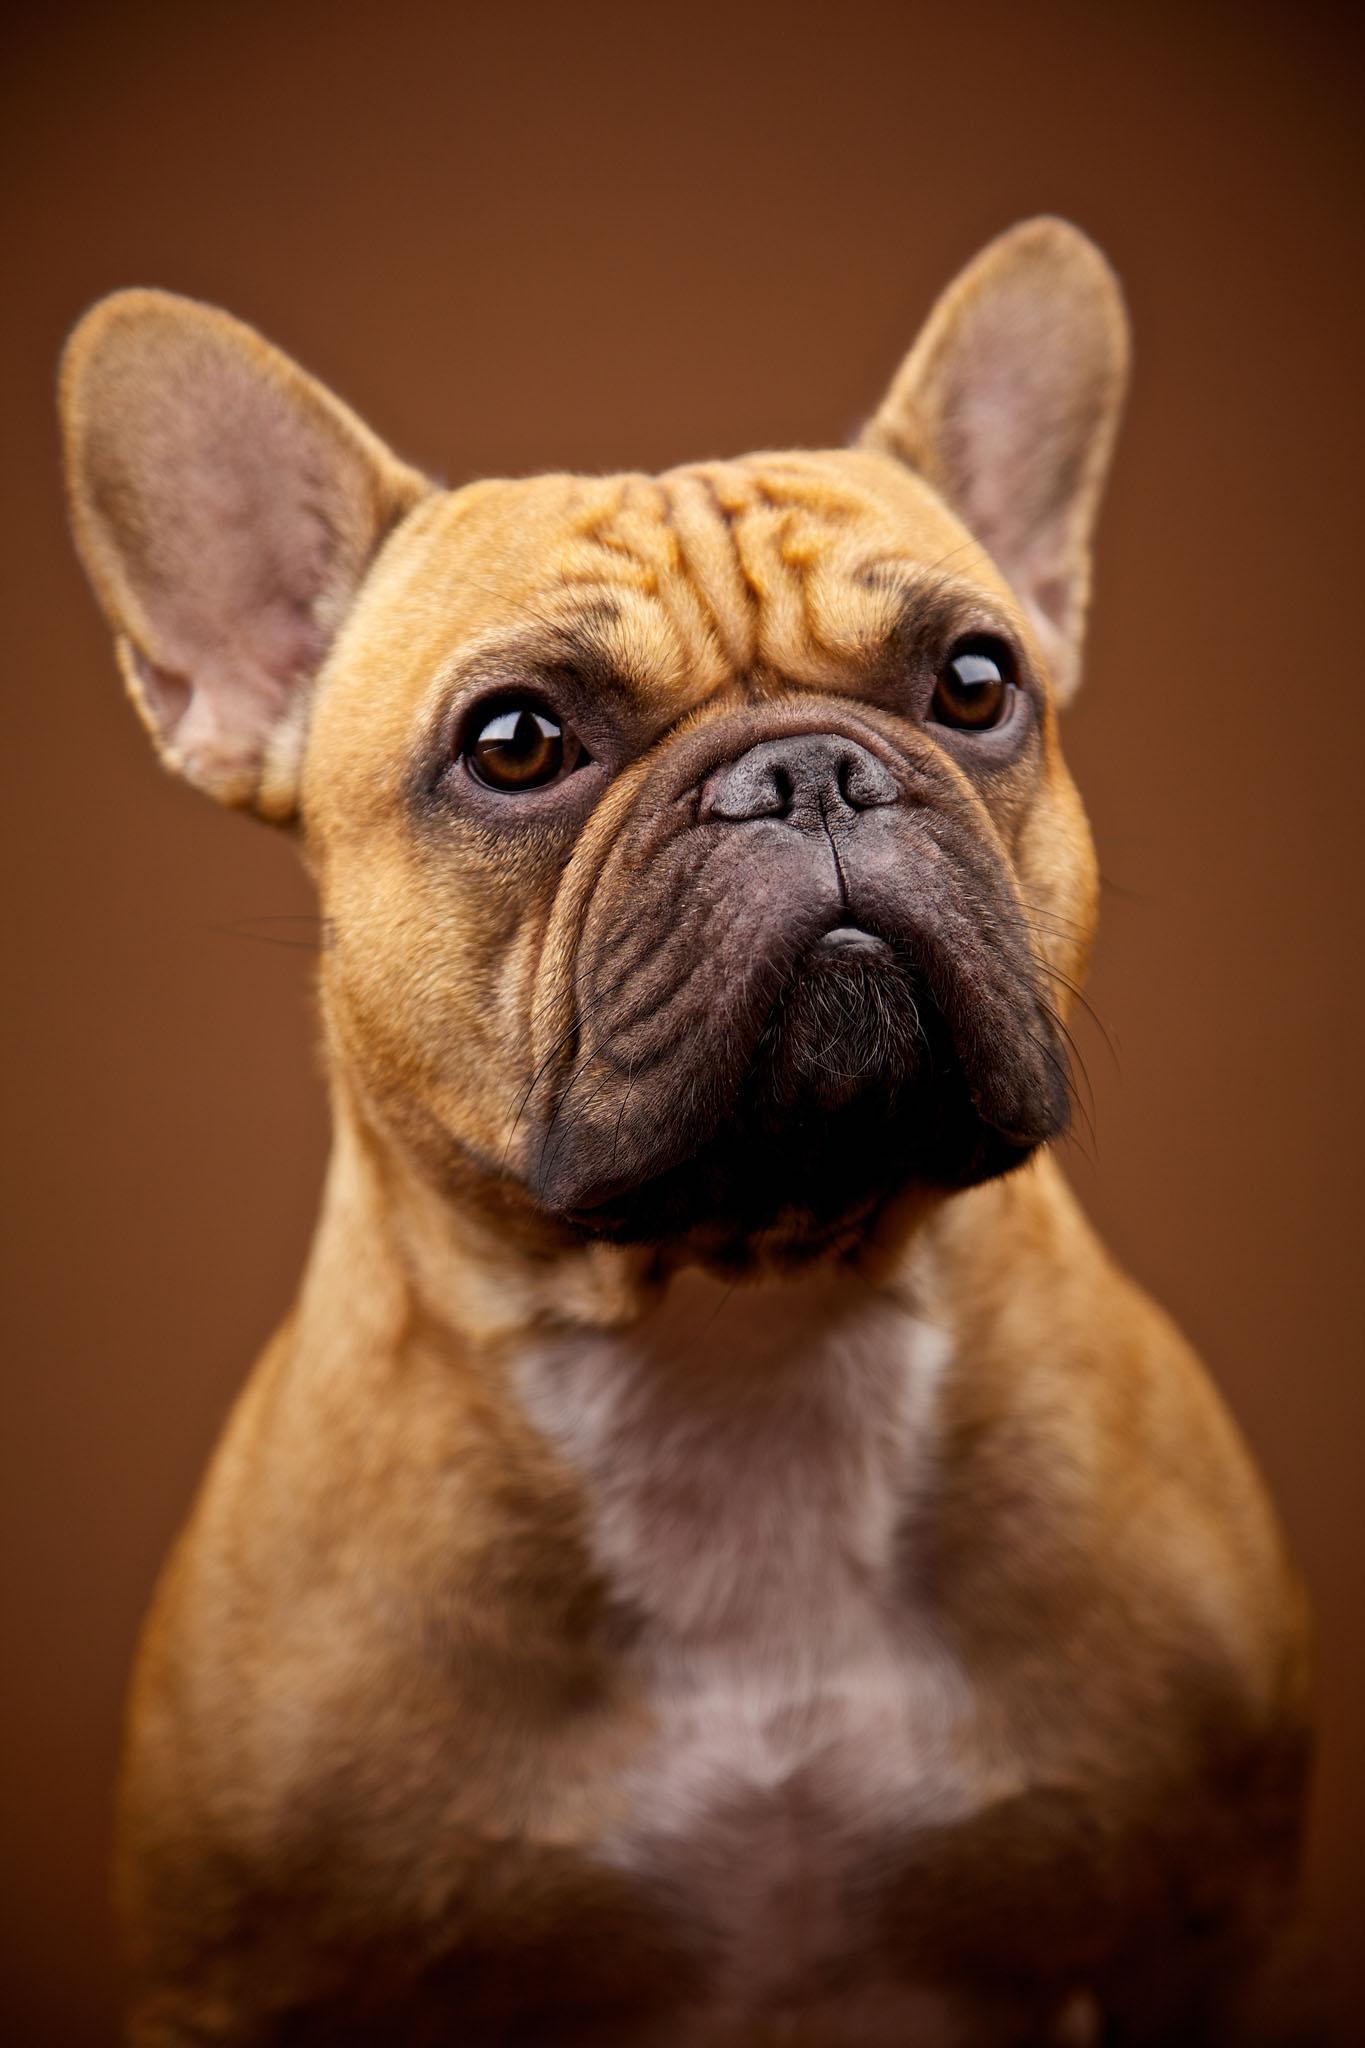 boprey-pet-photography-studio-nyc_27.jpg